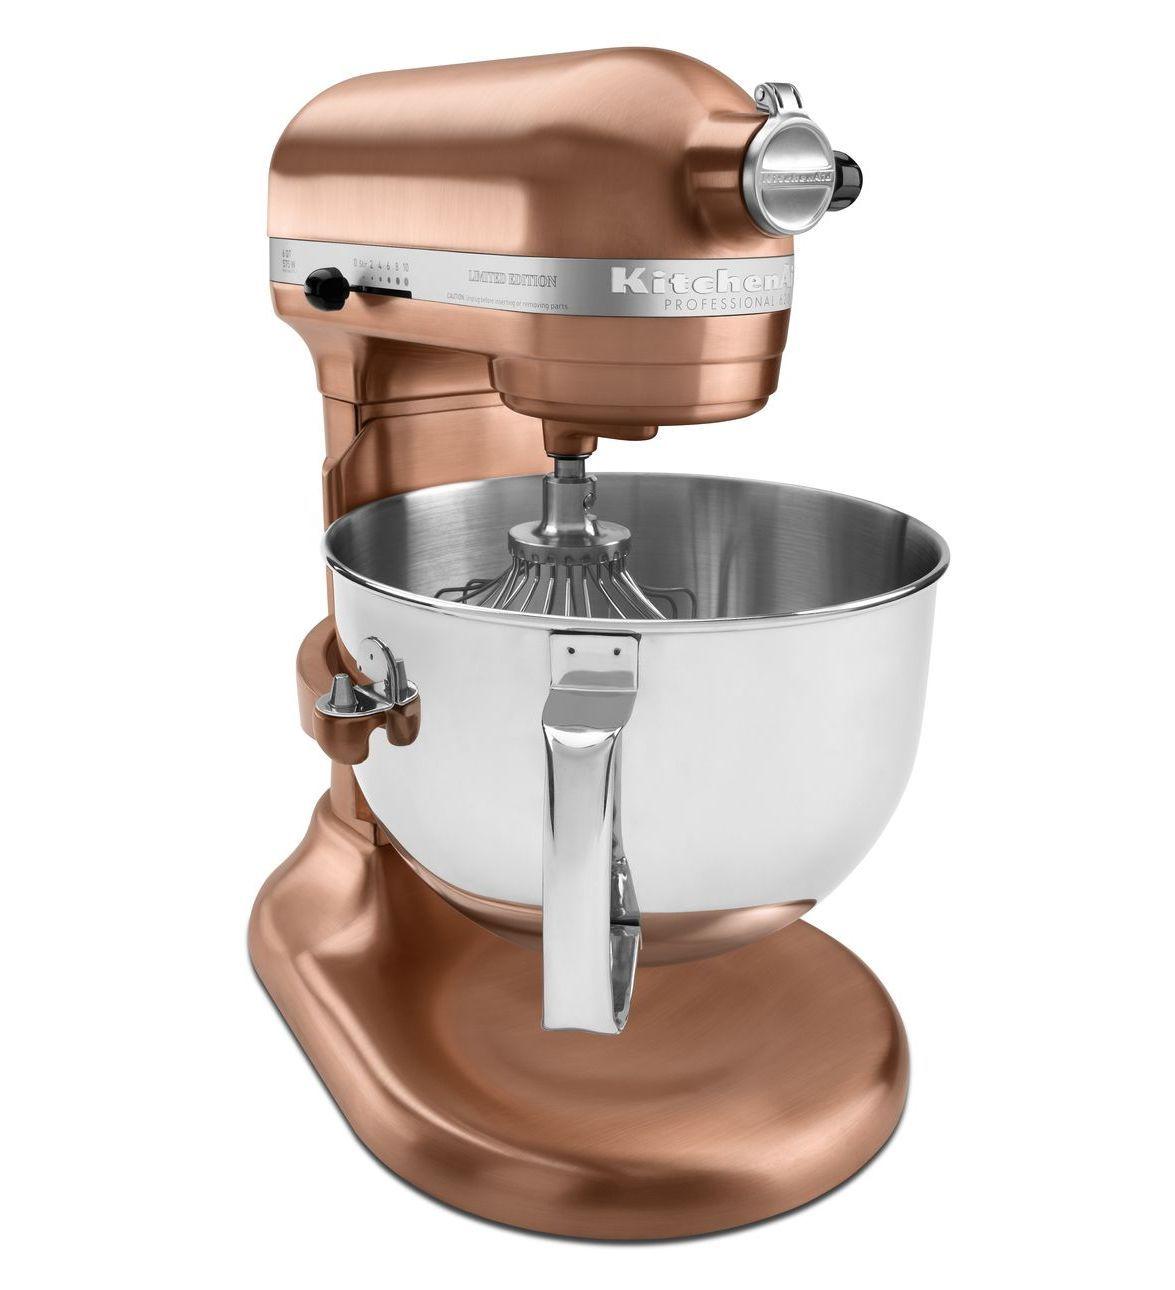 O M G Beautiful Kitchenaid Professional 620 6 Quart Bowl Lift